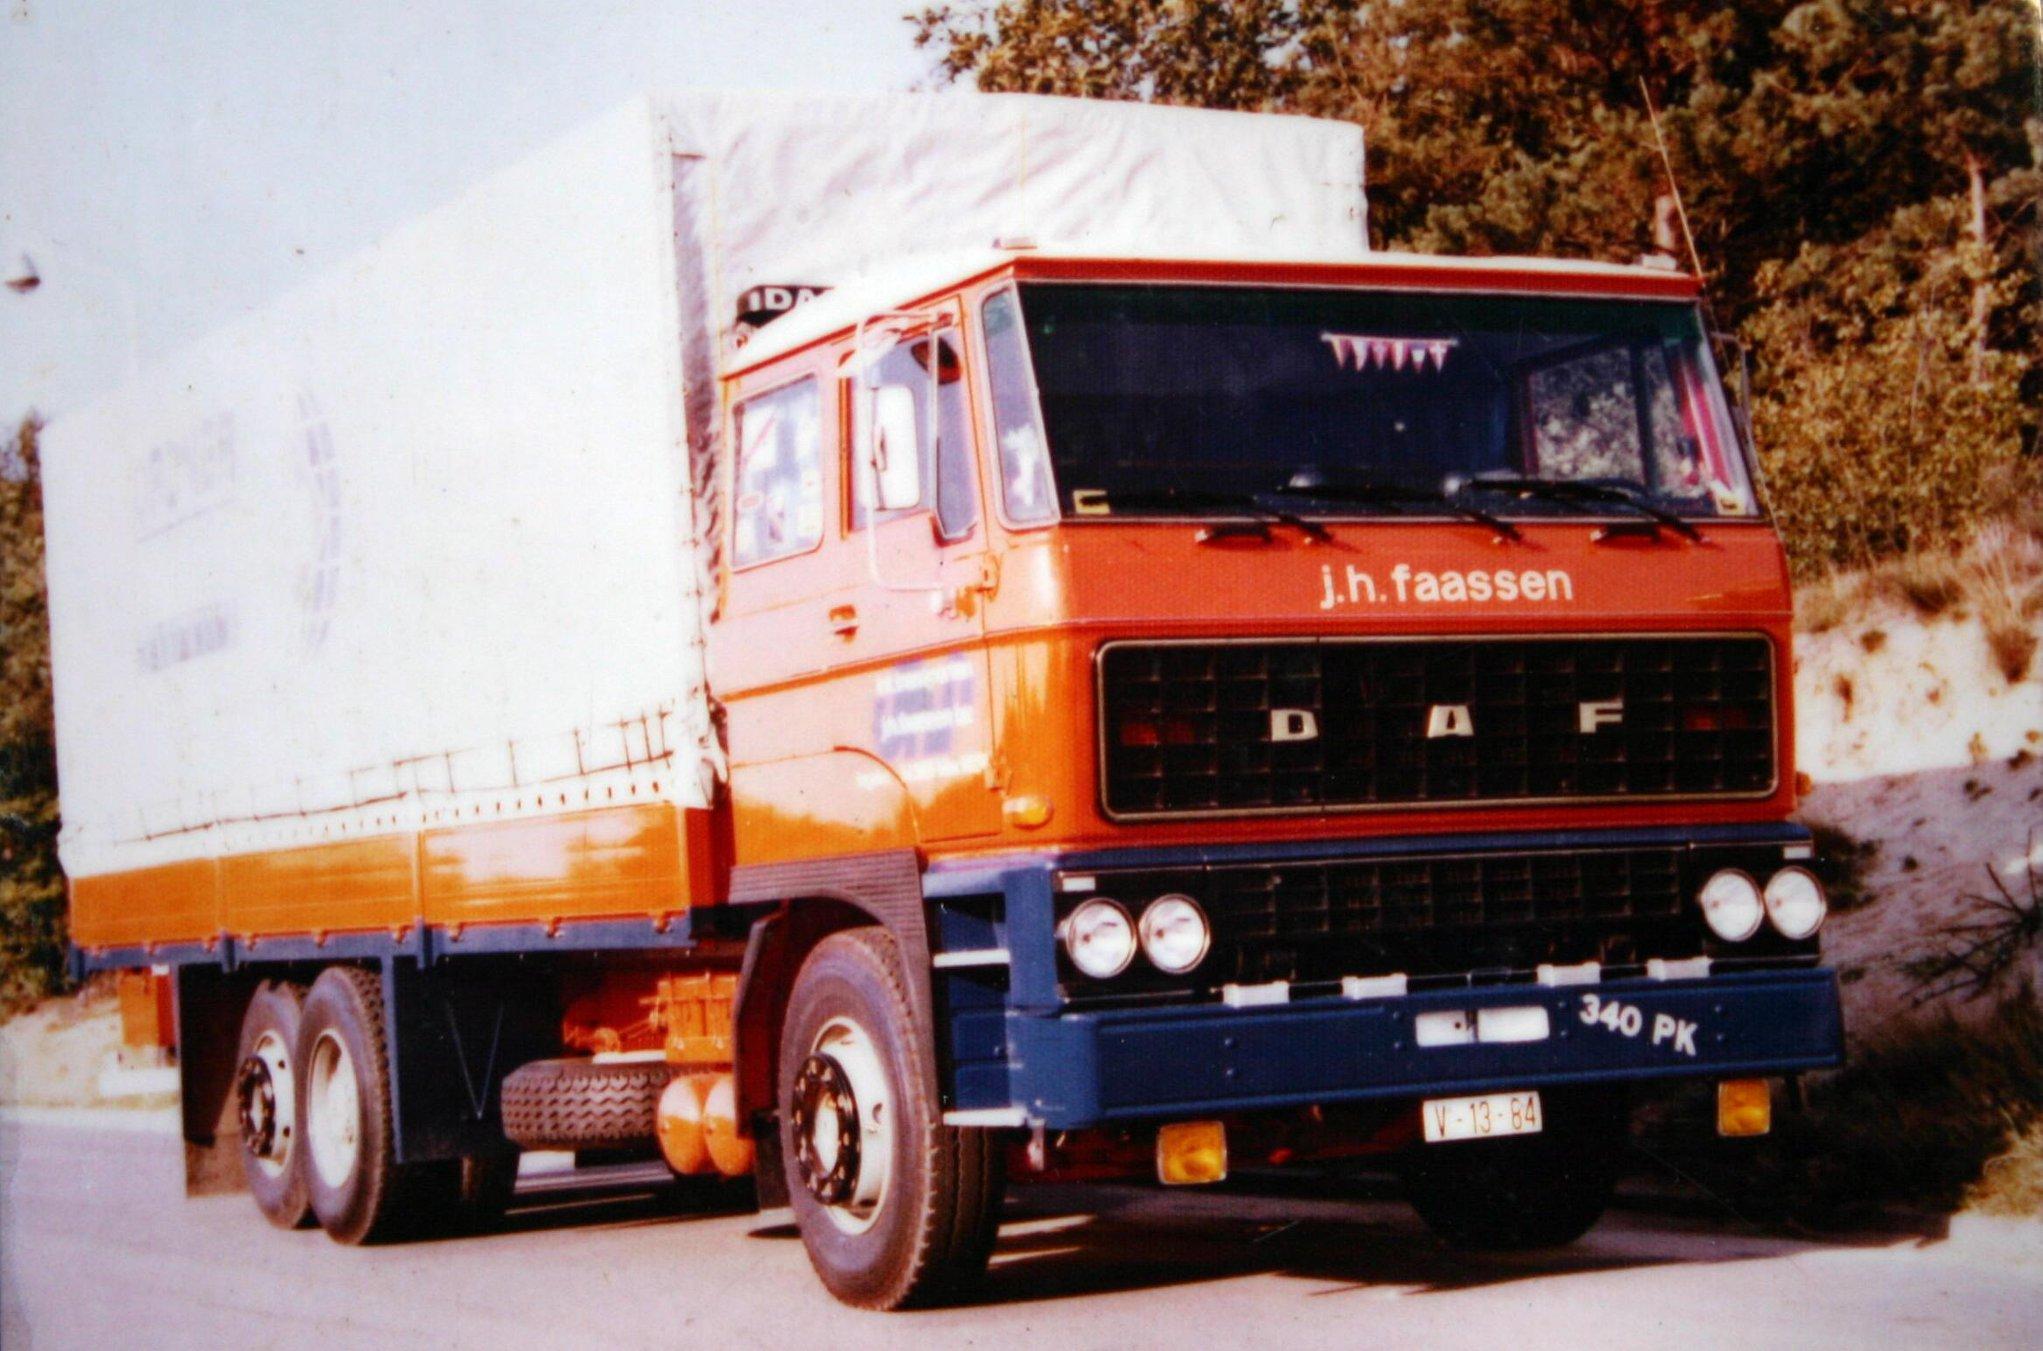 DAF-2800-Jan-Faassen-chauffeur--Math-Keijsers-archief